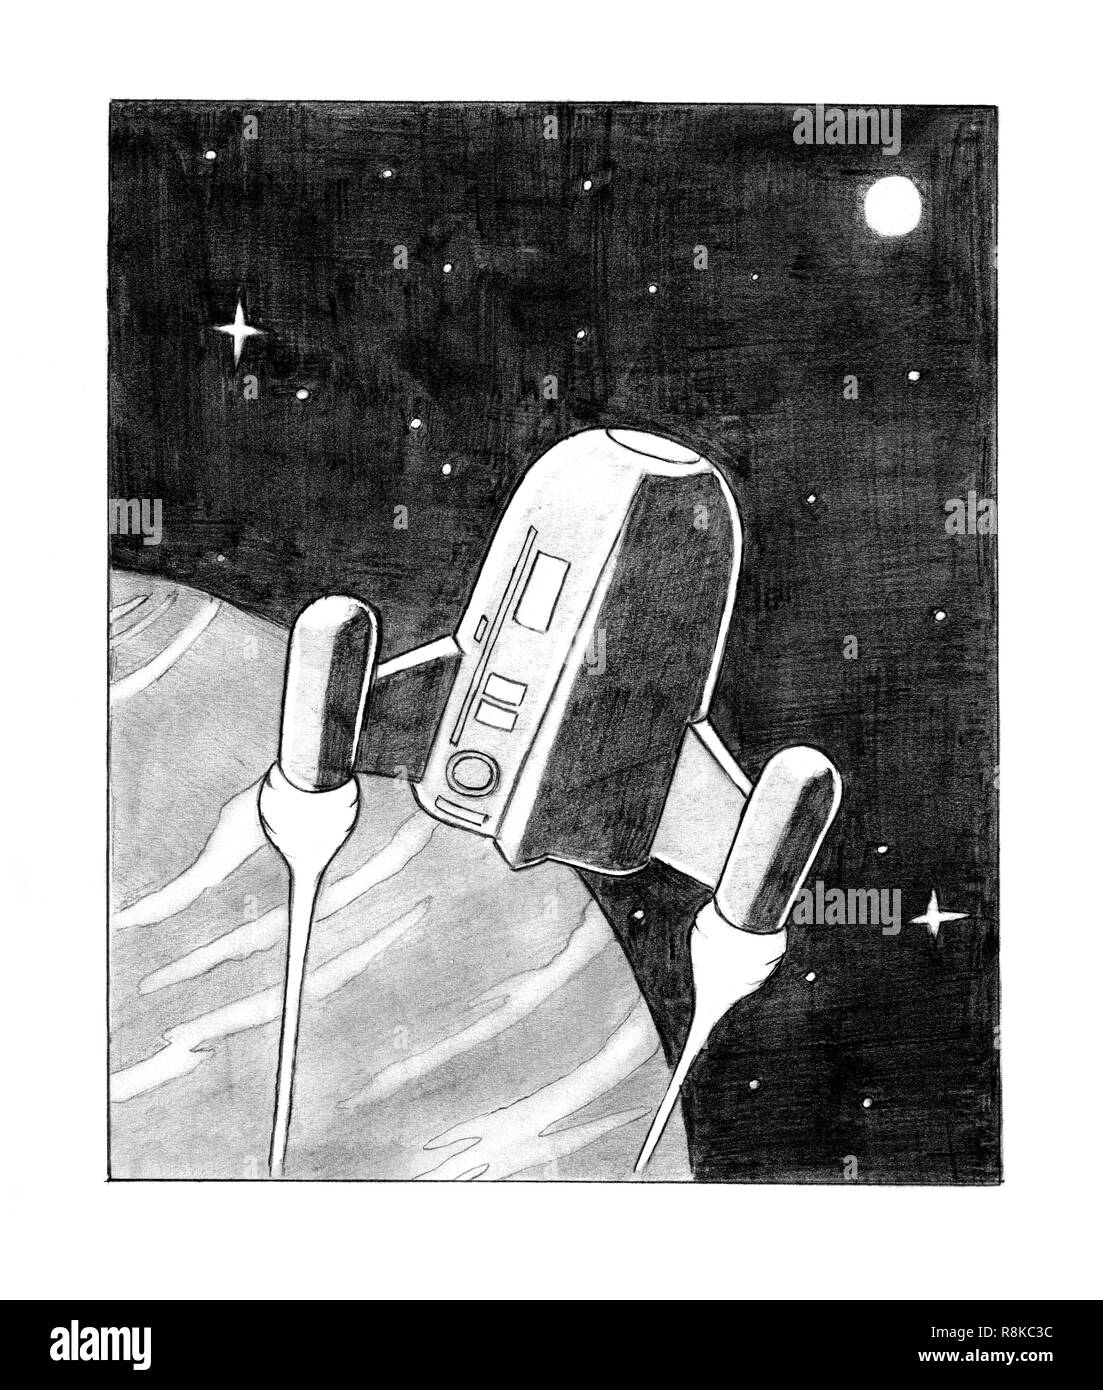 Pencil Drawing of sci-fi Spaceship on Planet Orbit - Stock Image